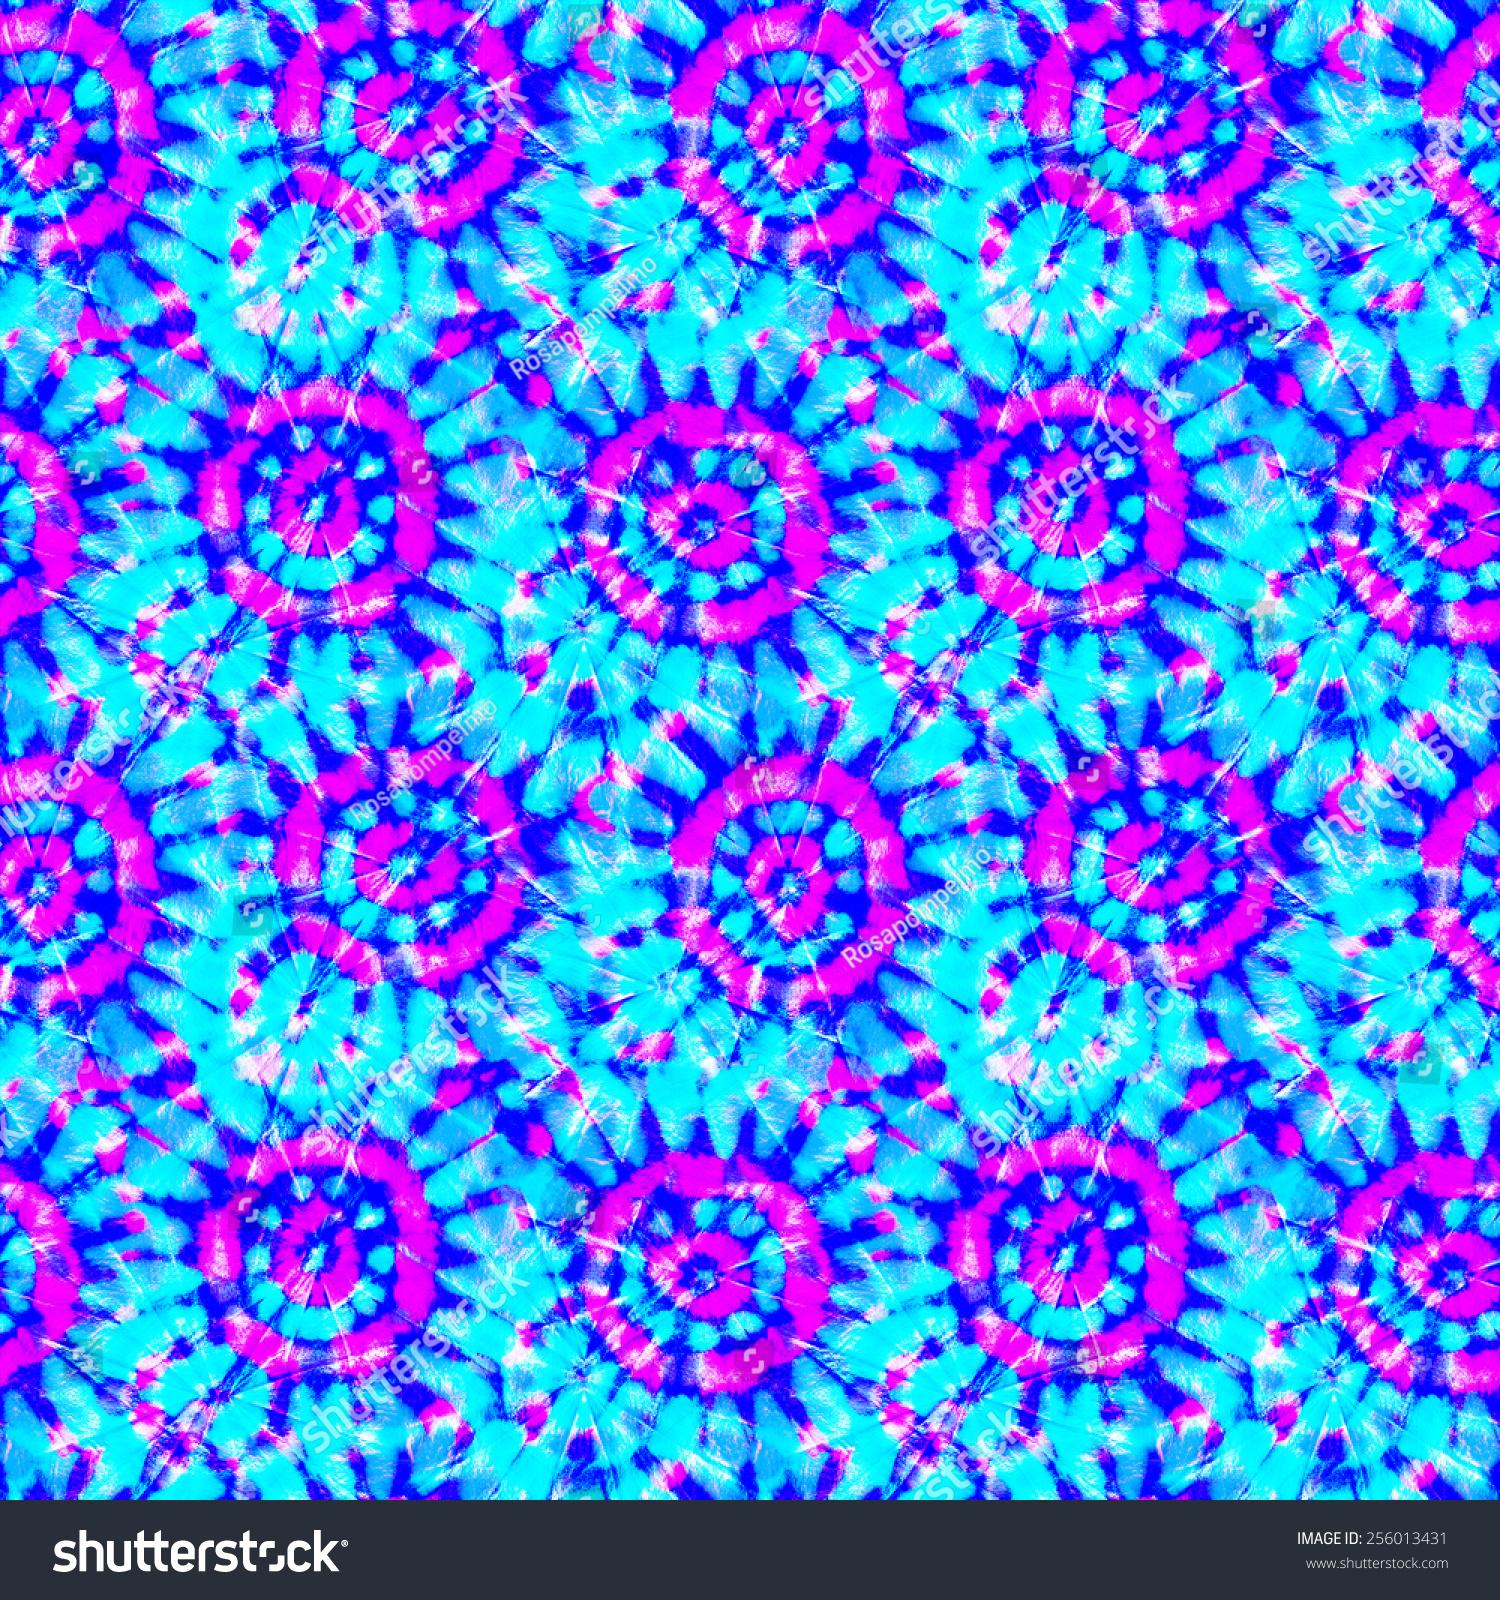 seamless repeating tie dye - photo #31